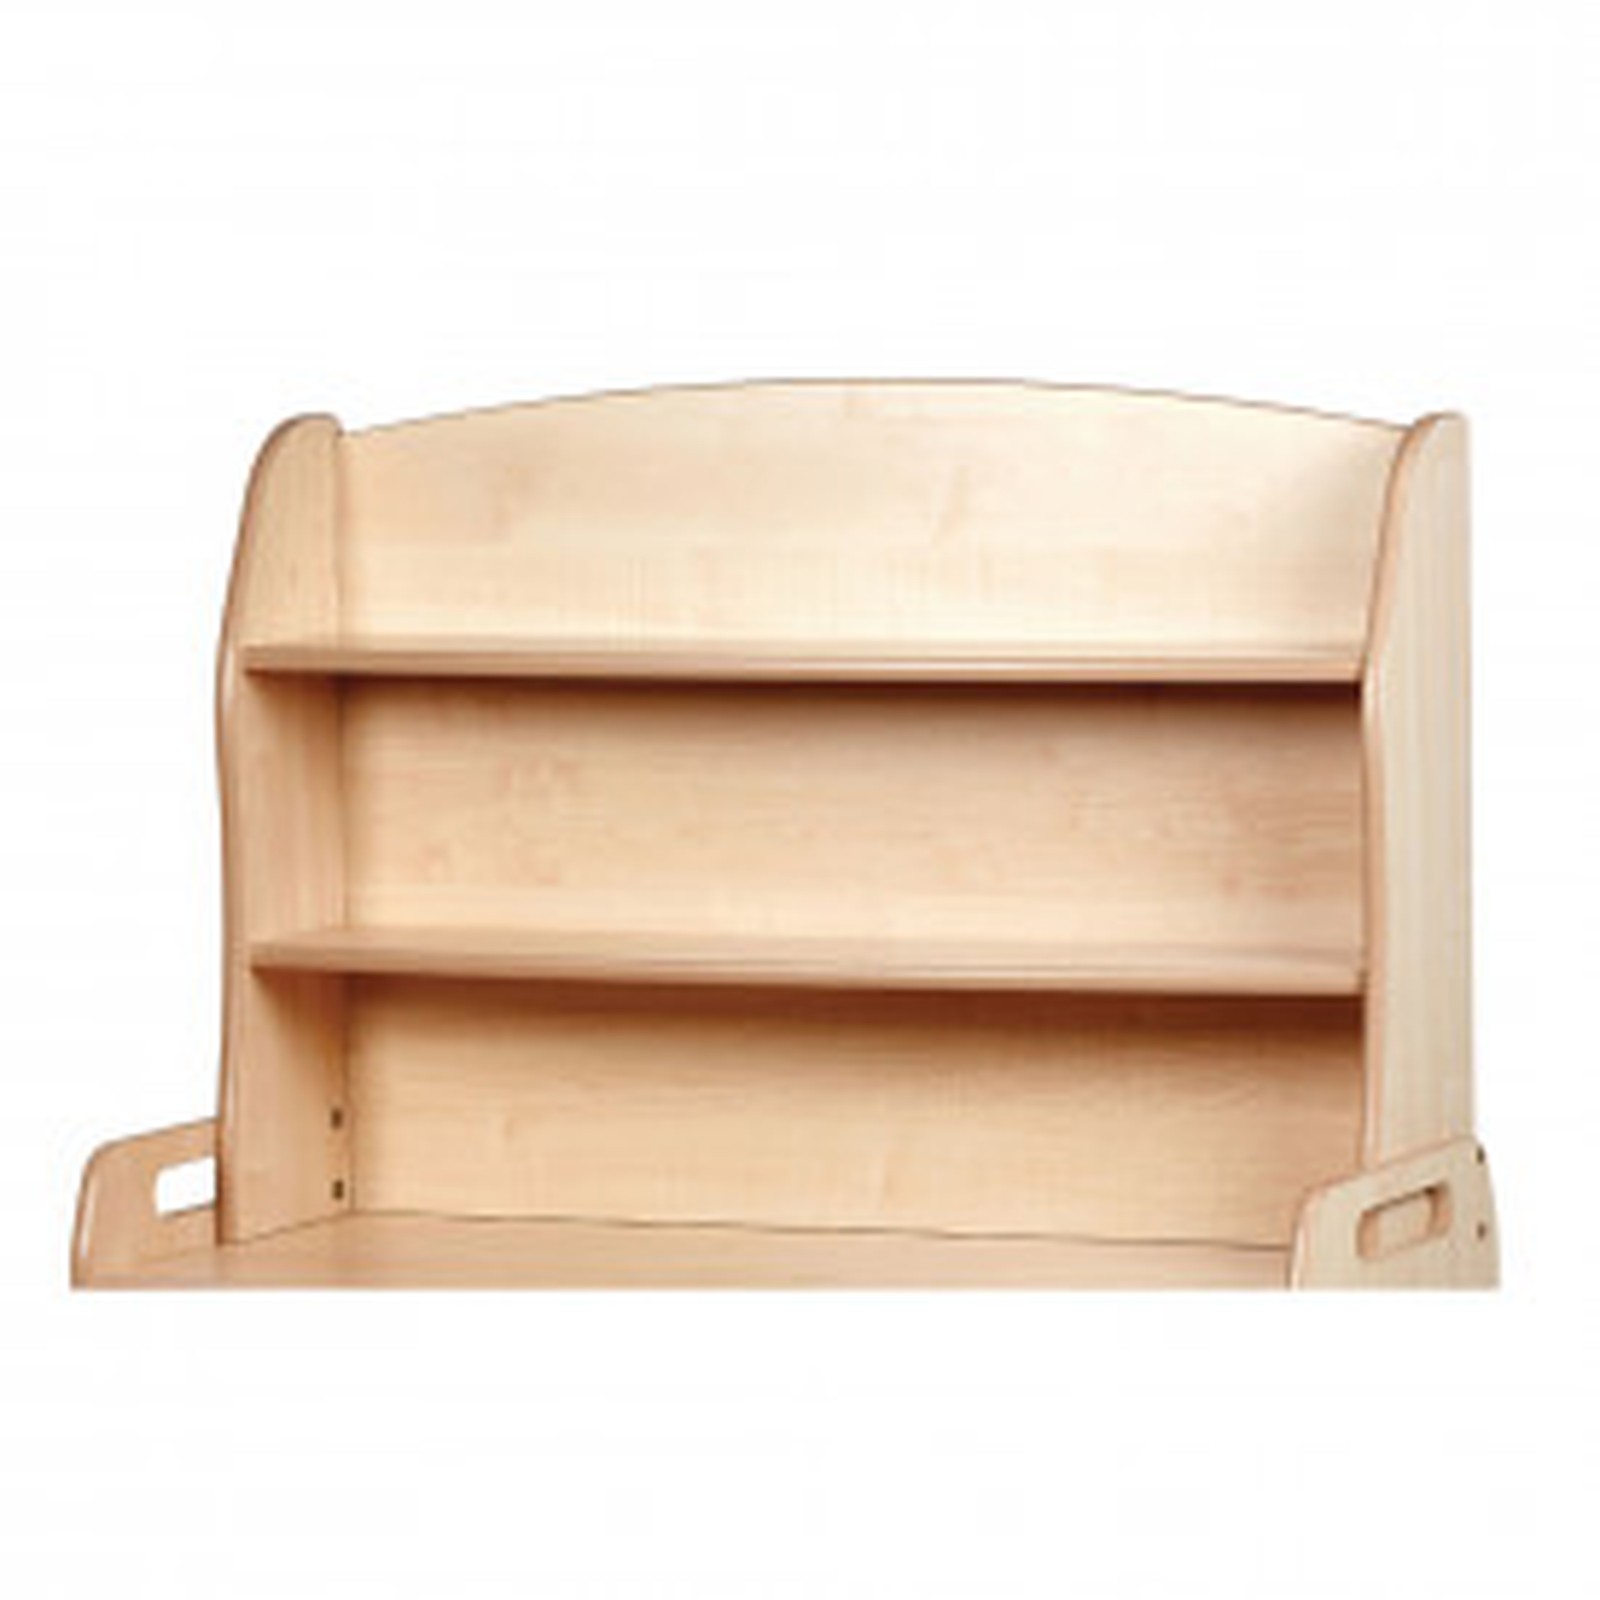 Welsh Dresser Add-on for Three Column Tray Units